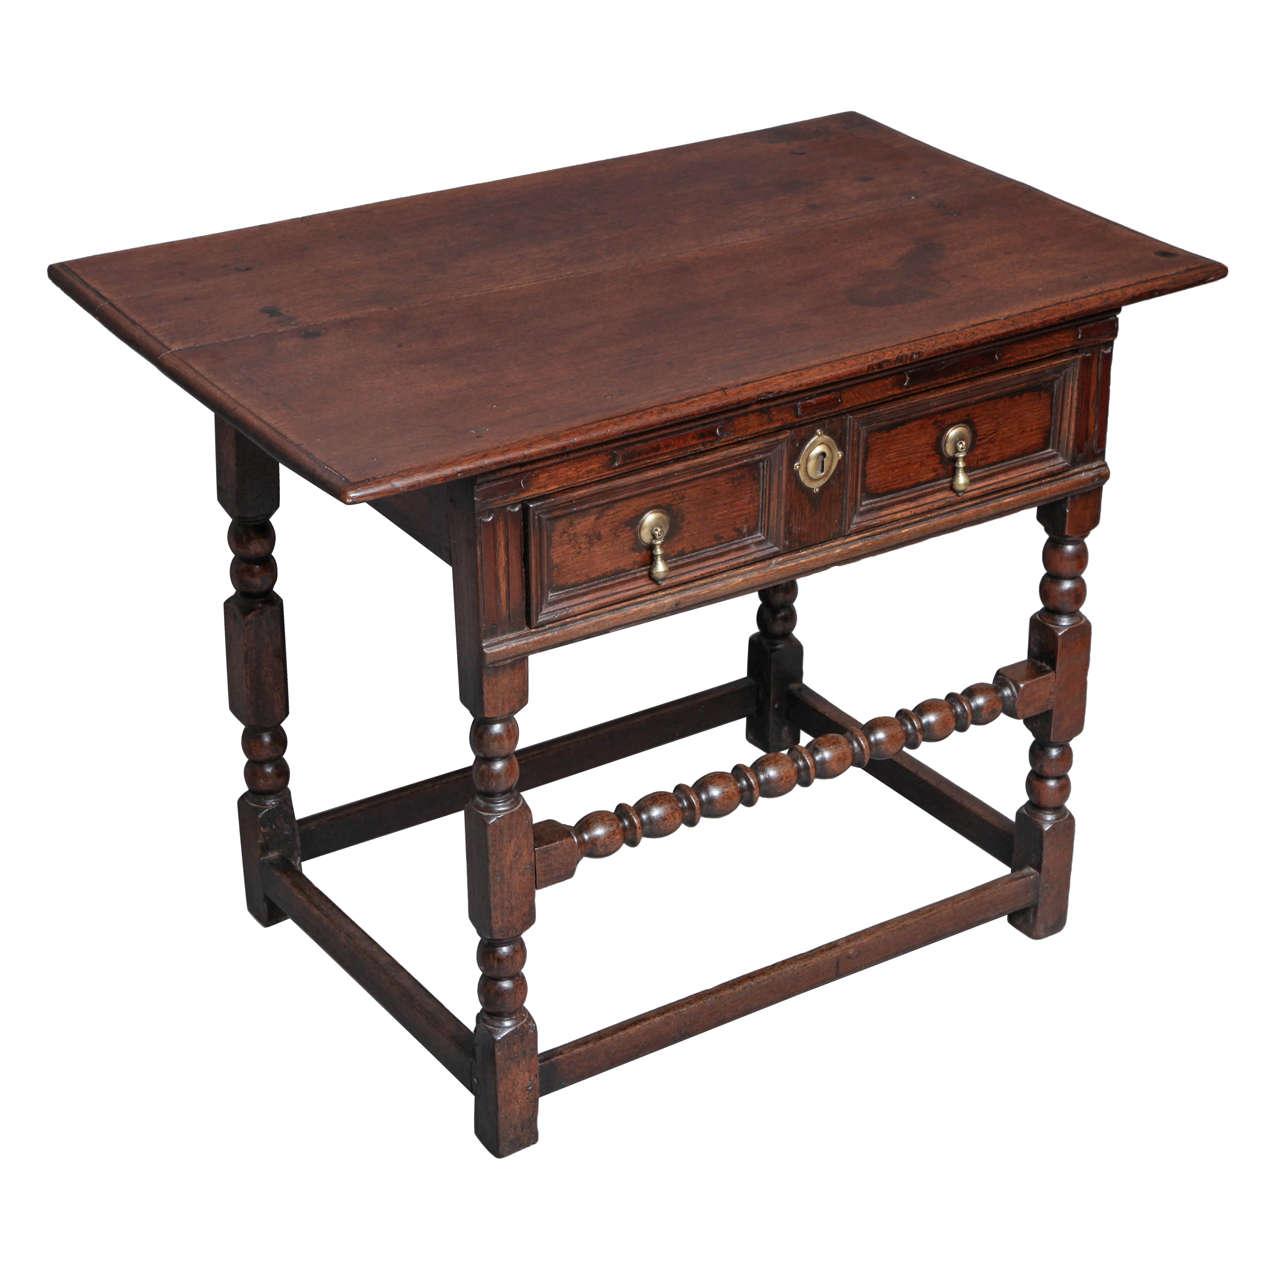 Charles II Oak Side Table For Sale at 1stdibs